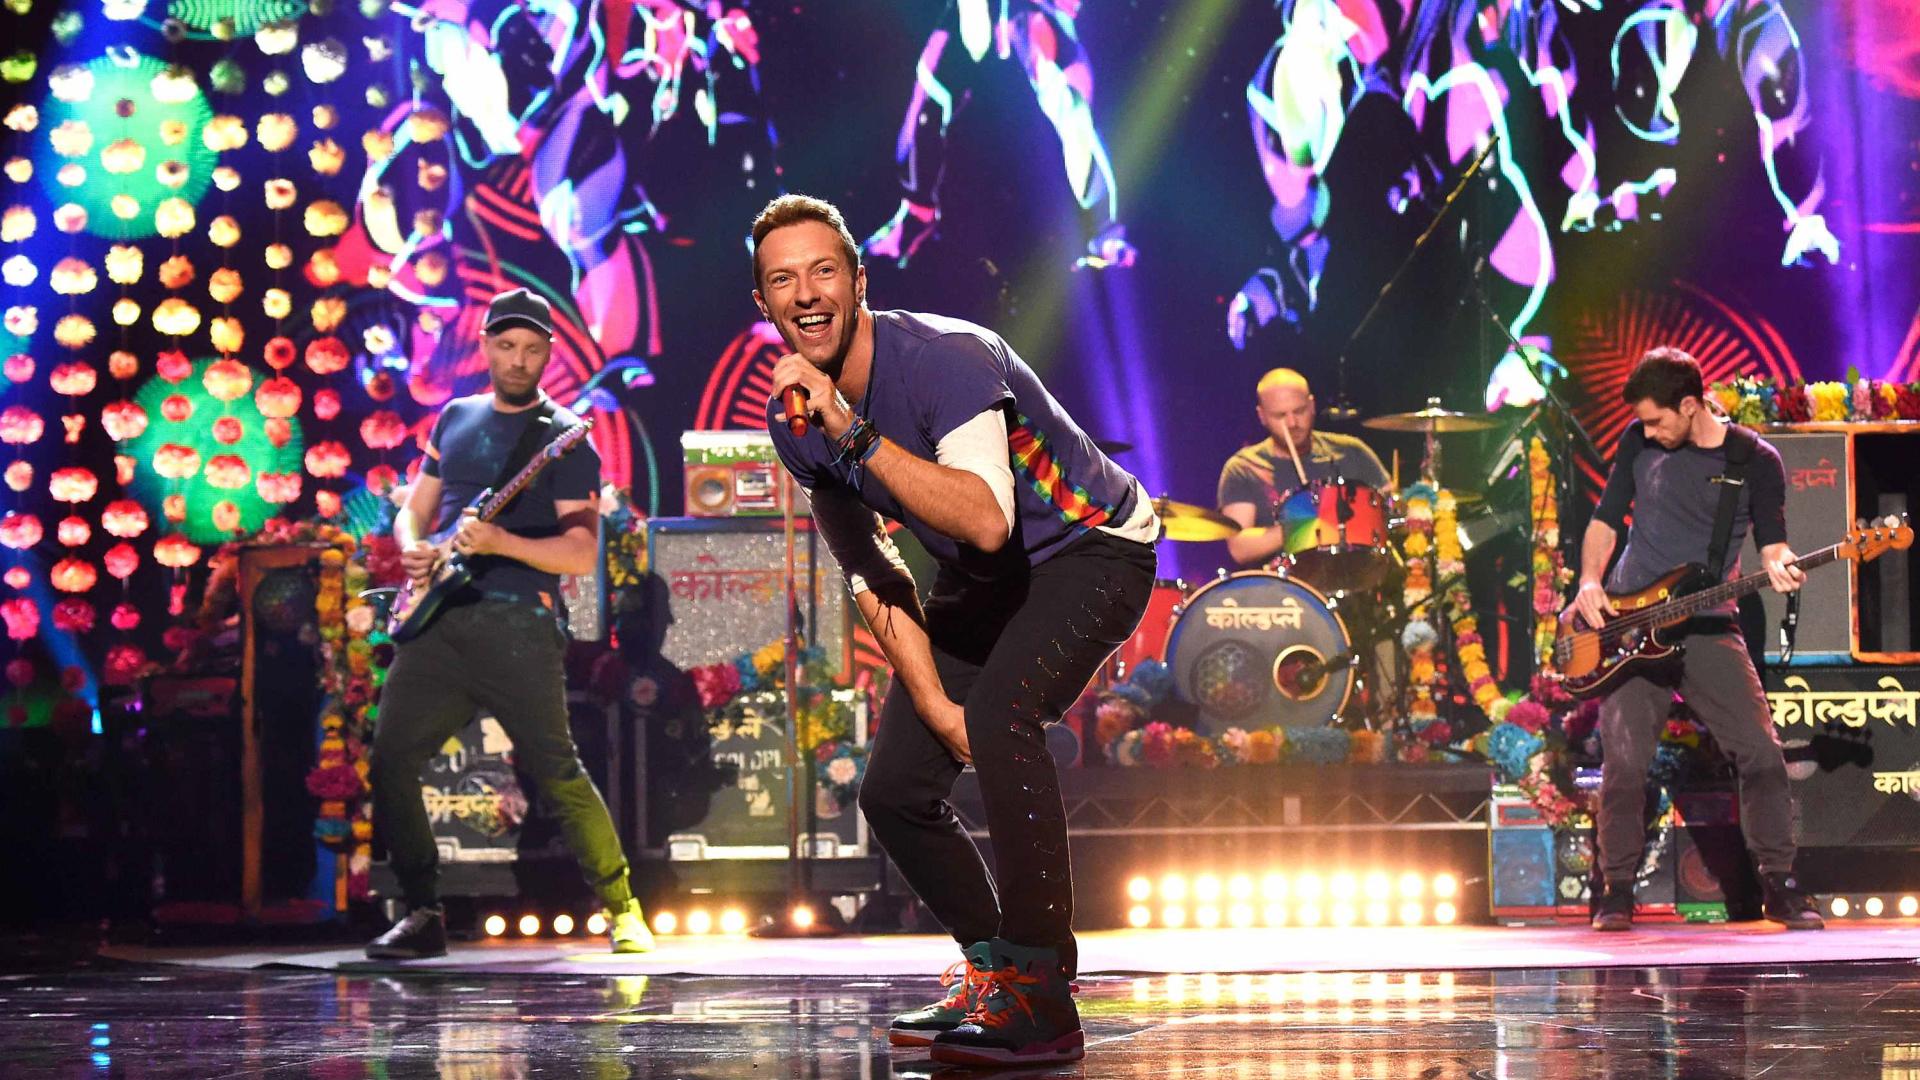 Coldplay_Live_Singapore (0-00-02-18).jpg